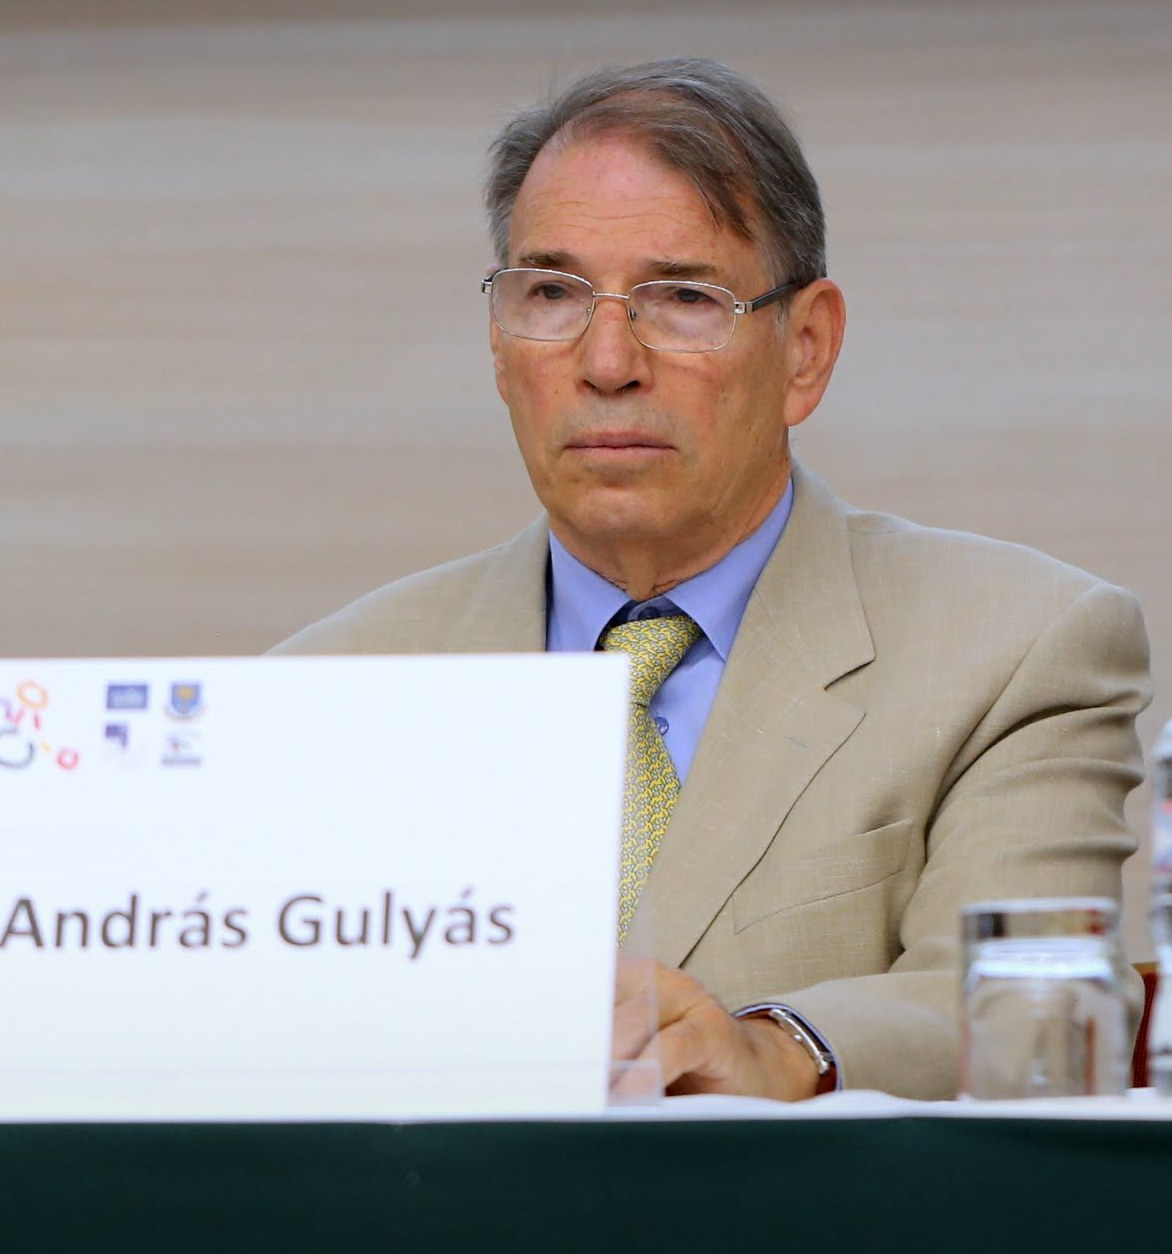 Ambassador András Gulyás on a Conference, 2010